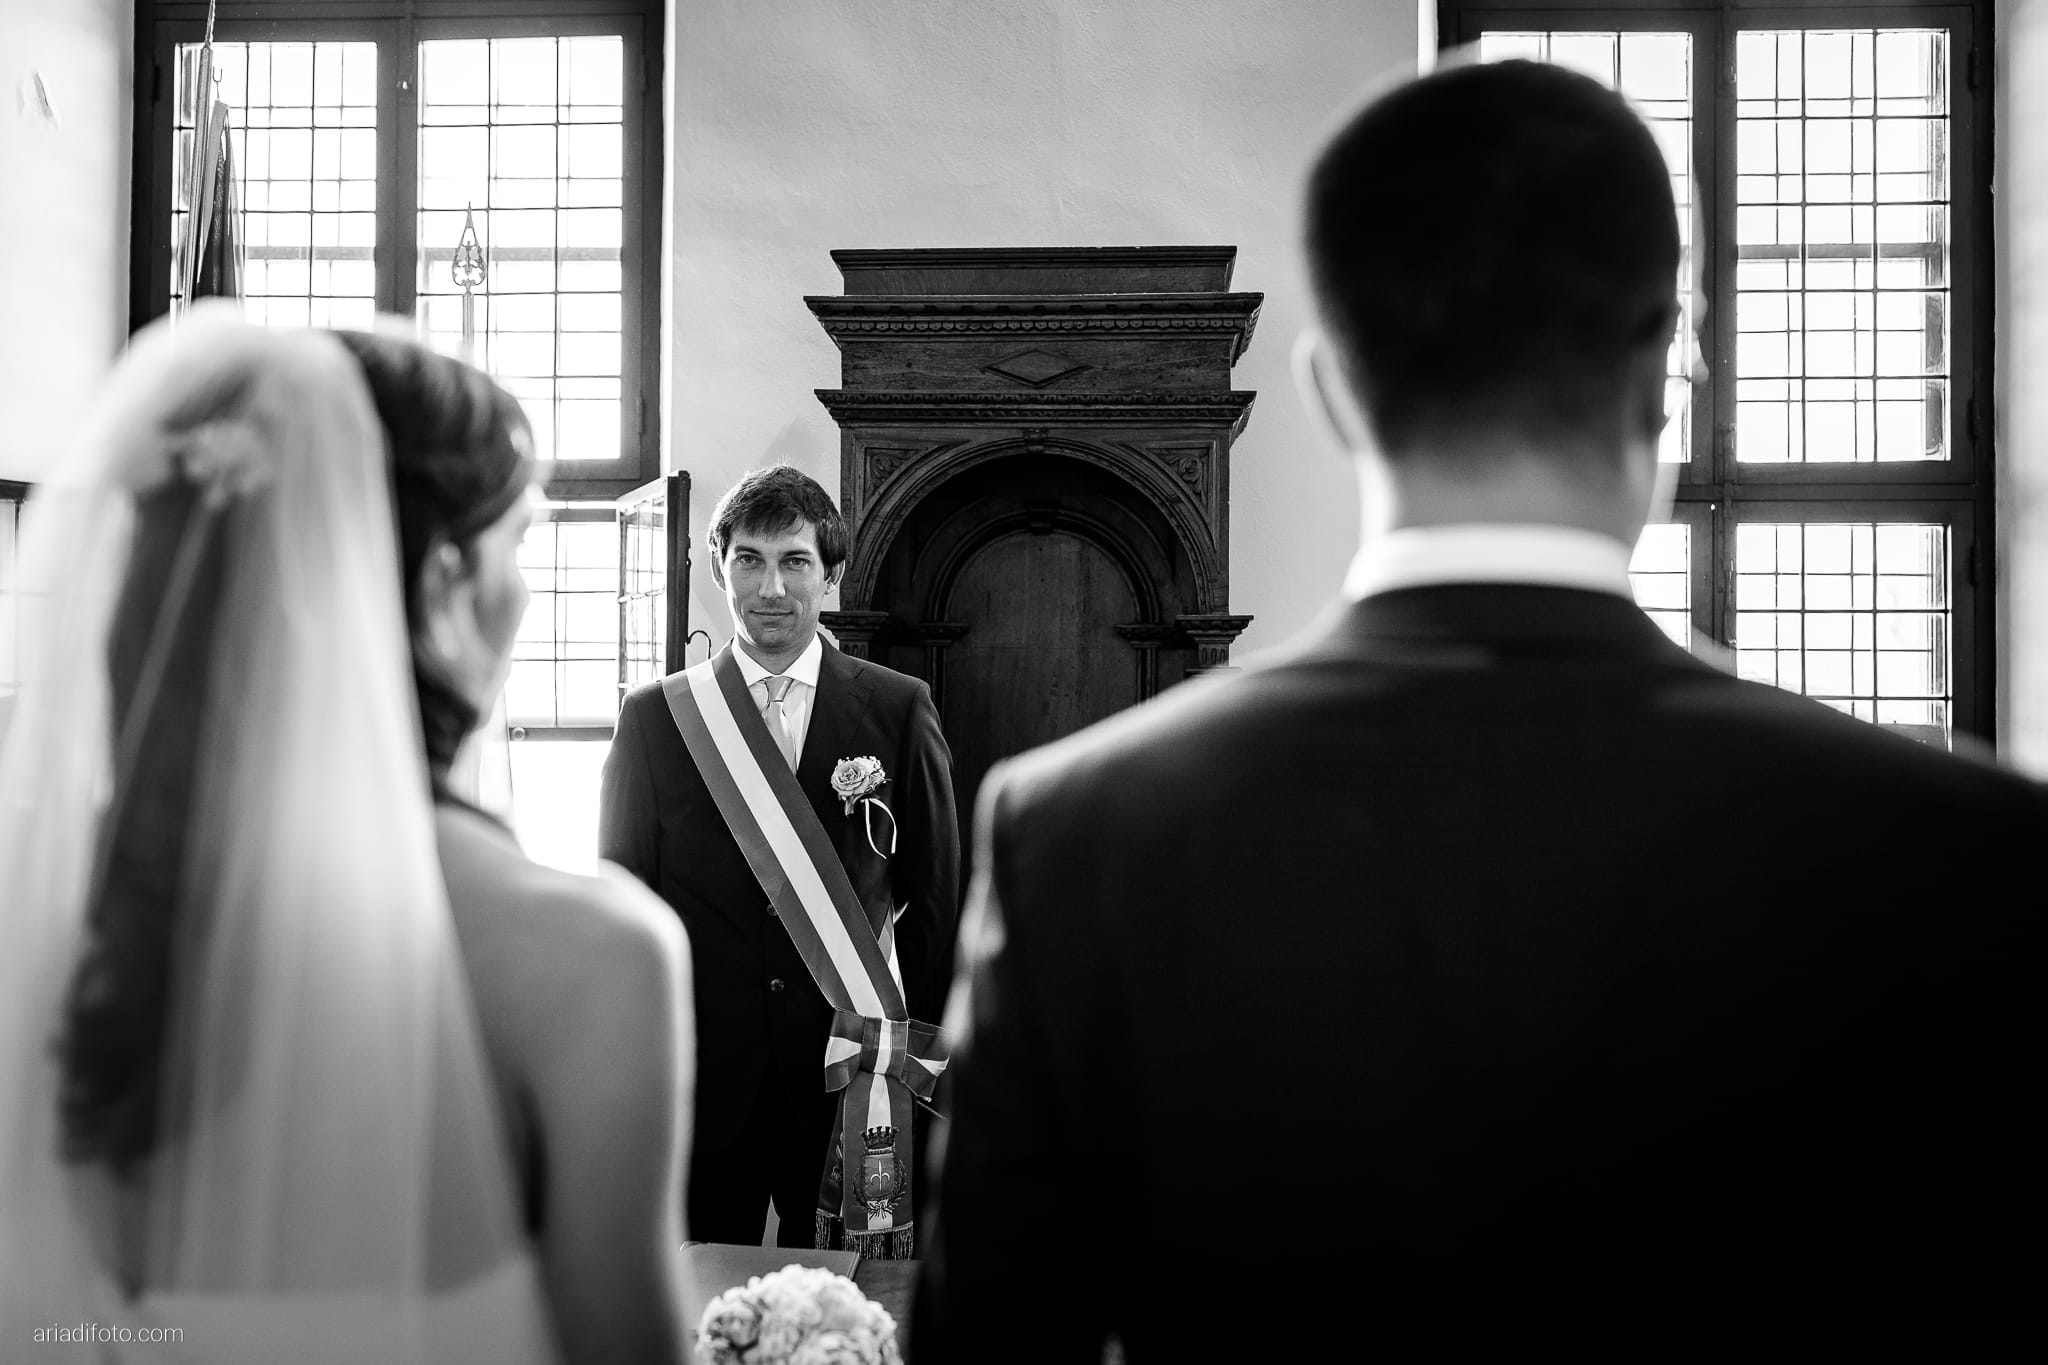 Marina Stefano Matrimonio Castello San Giusto Molo IV Trieste cerimonia civile